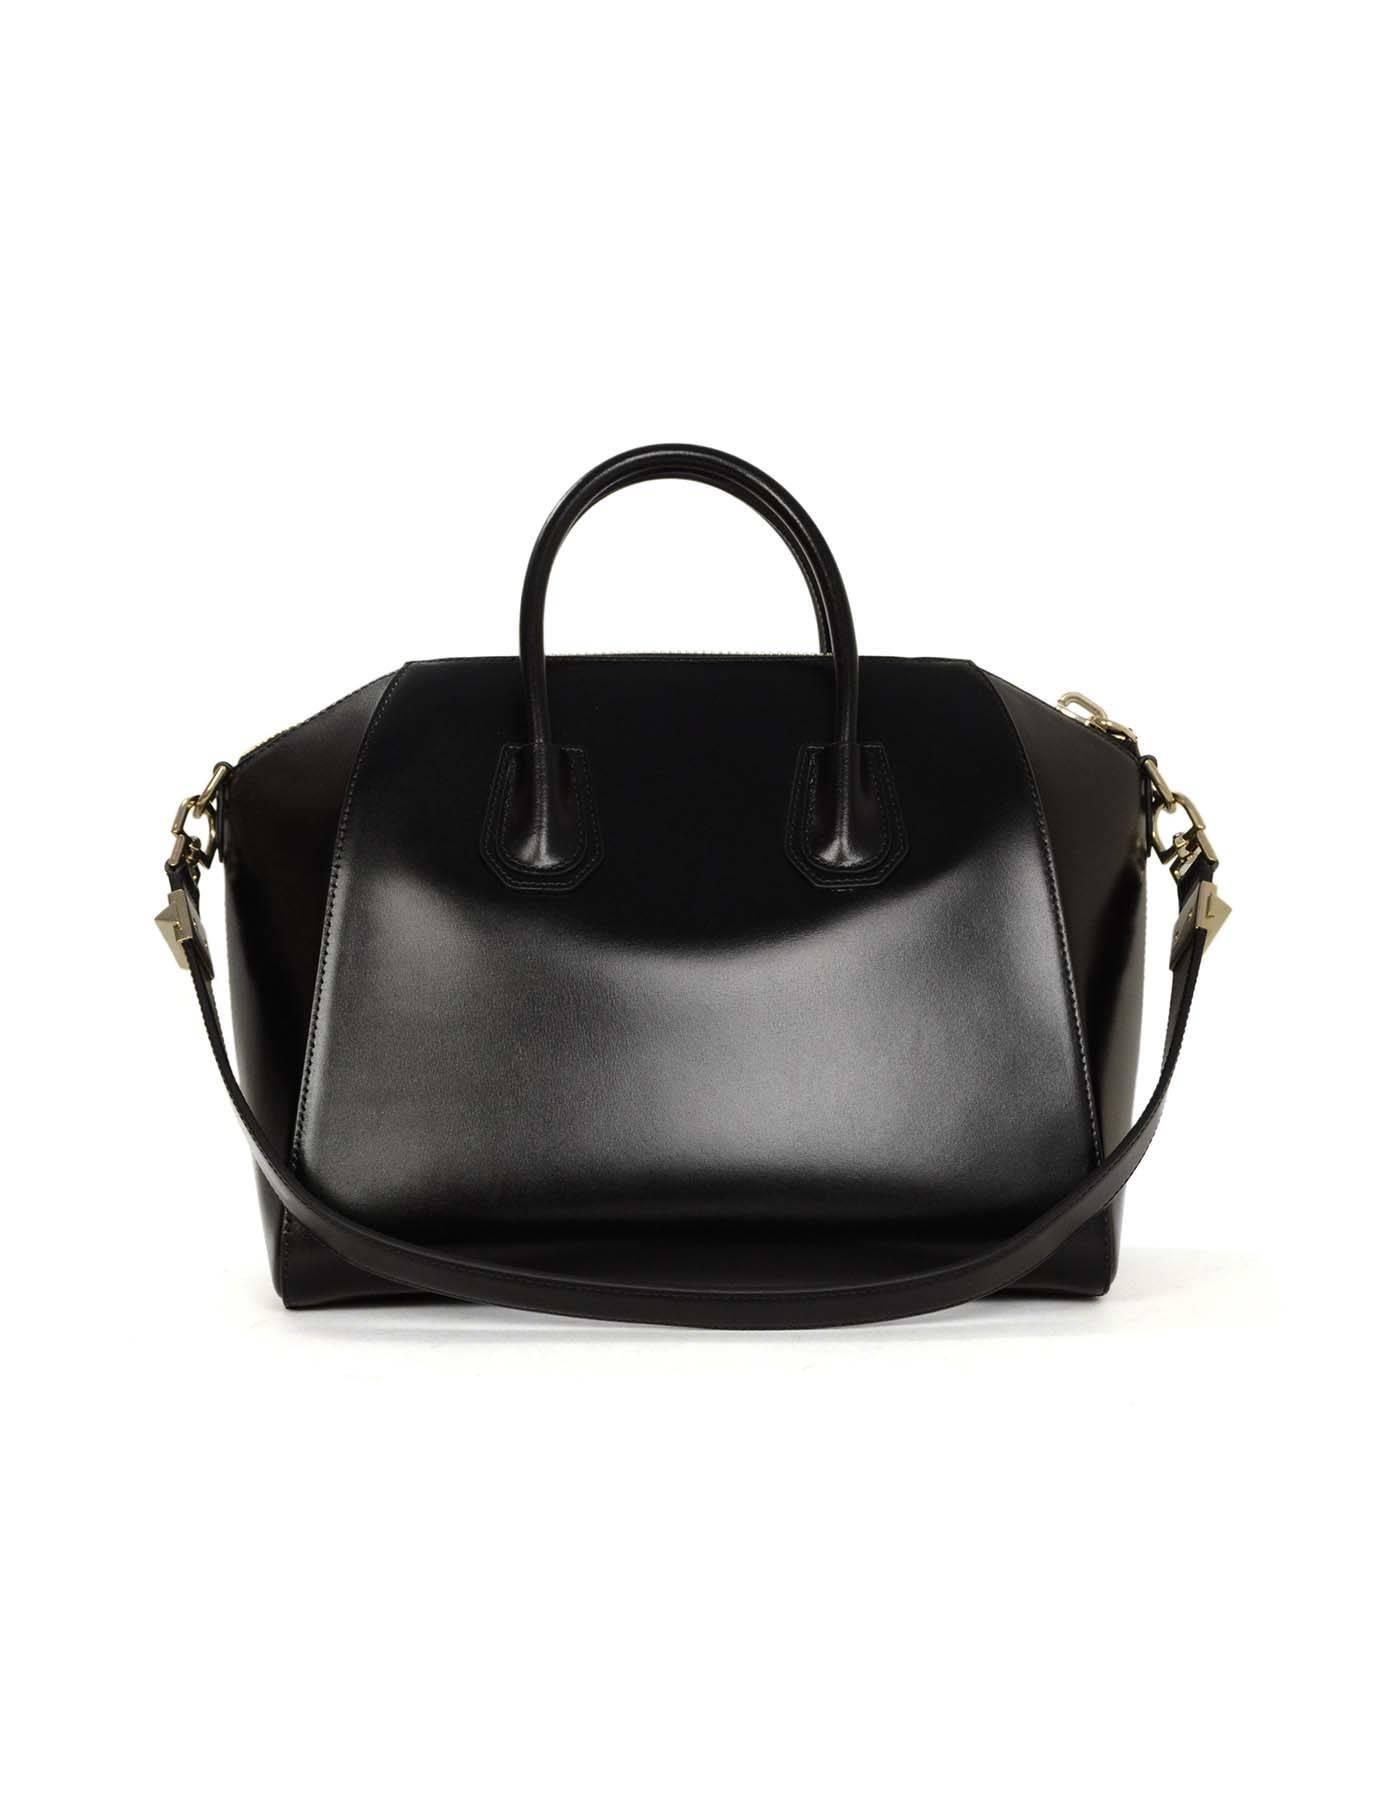 18c015b430 Givenchy Black Shiny Calfskin Medium Antigona Black SHW For Sale at 1stdibs